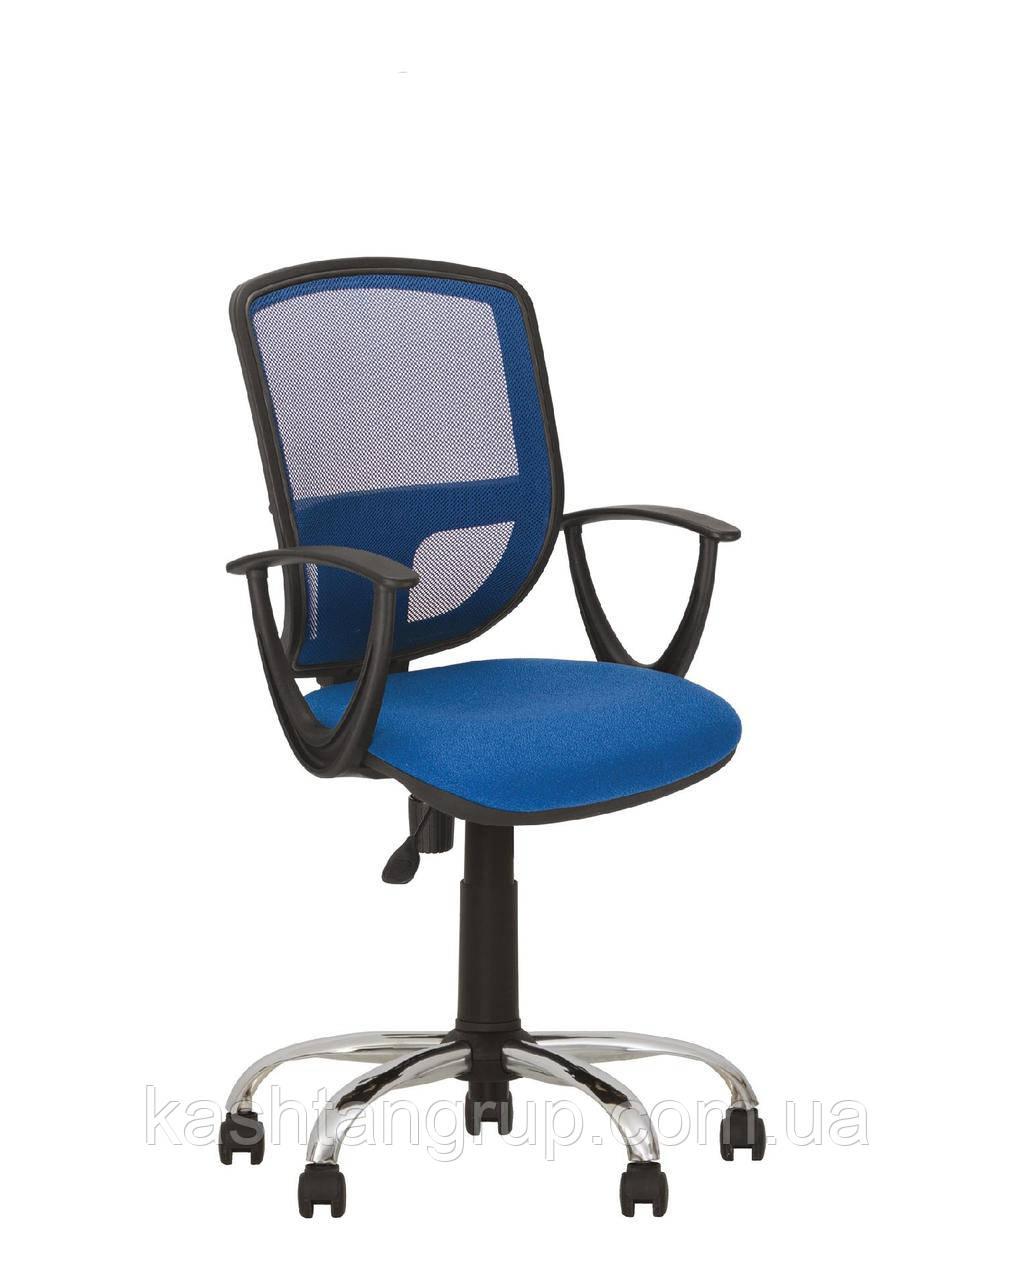 Кресло BETTA GTP Freestyle CHR68